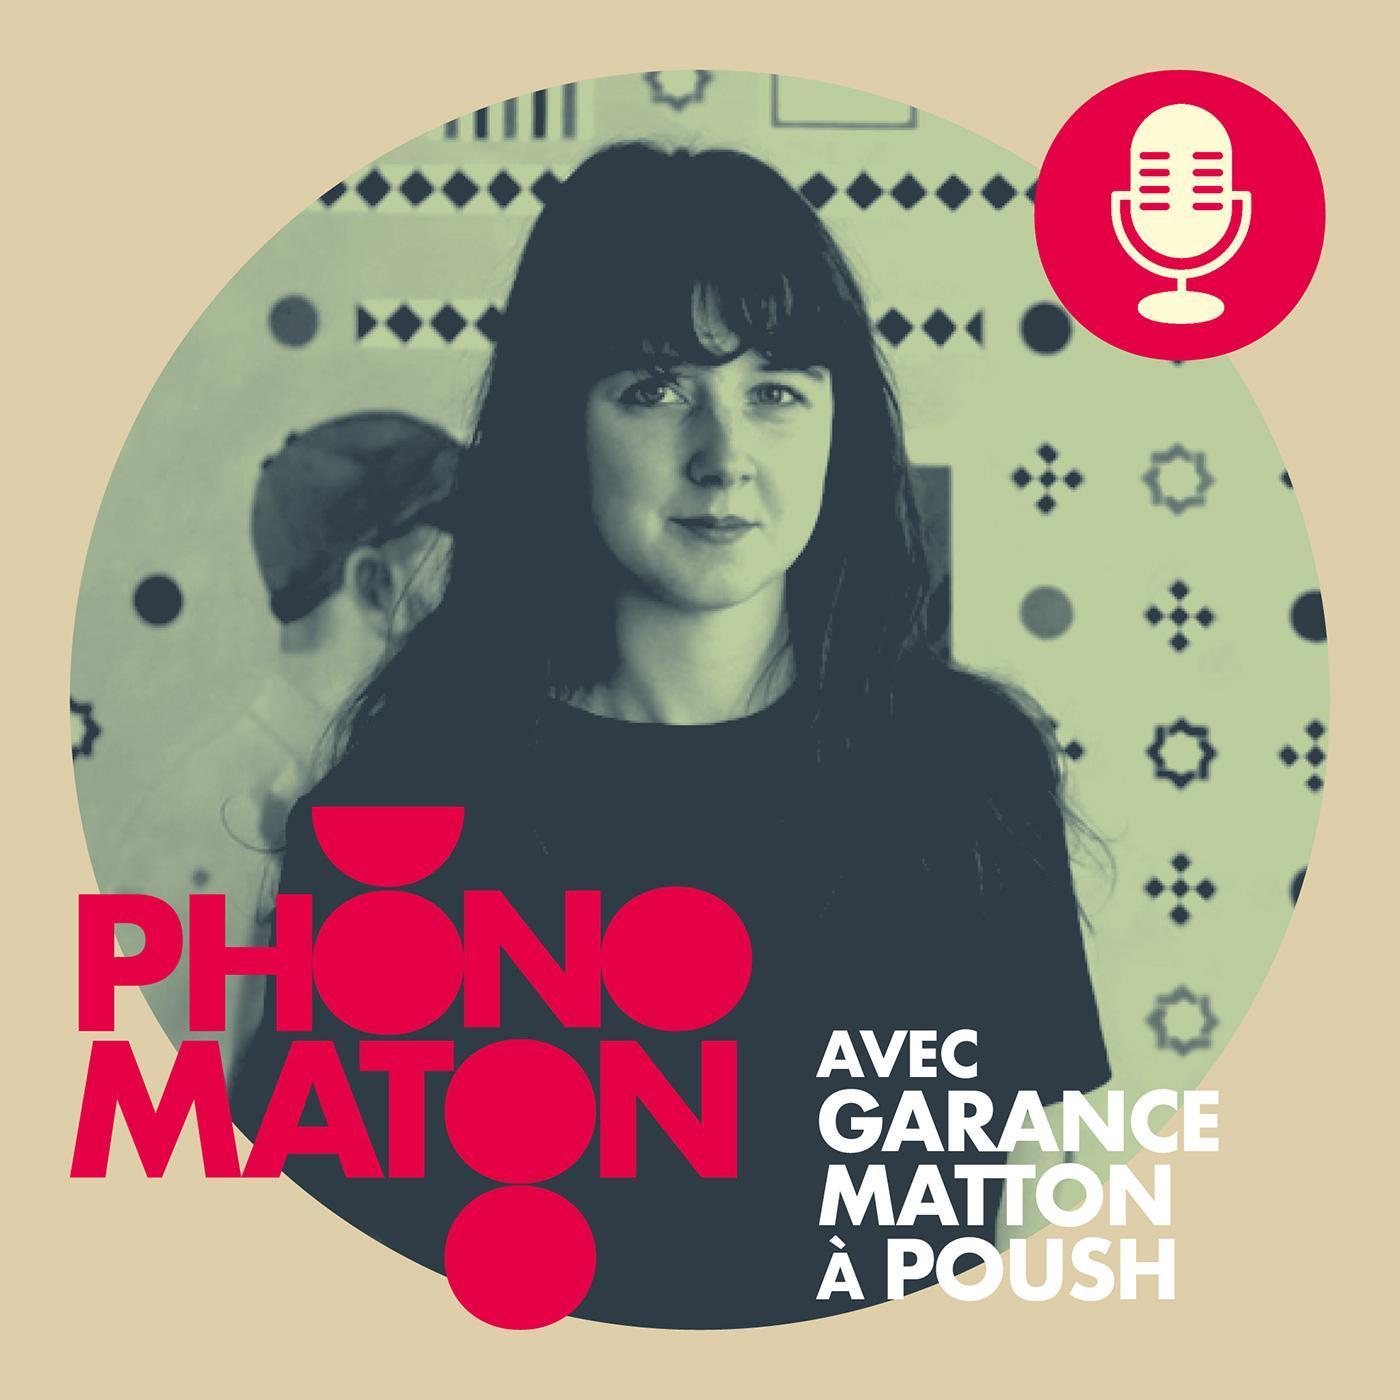 Phonomaton avec Garance Matton